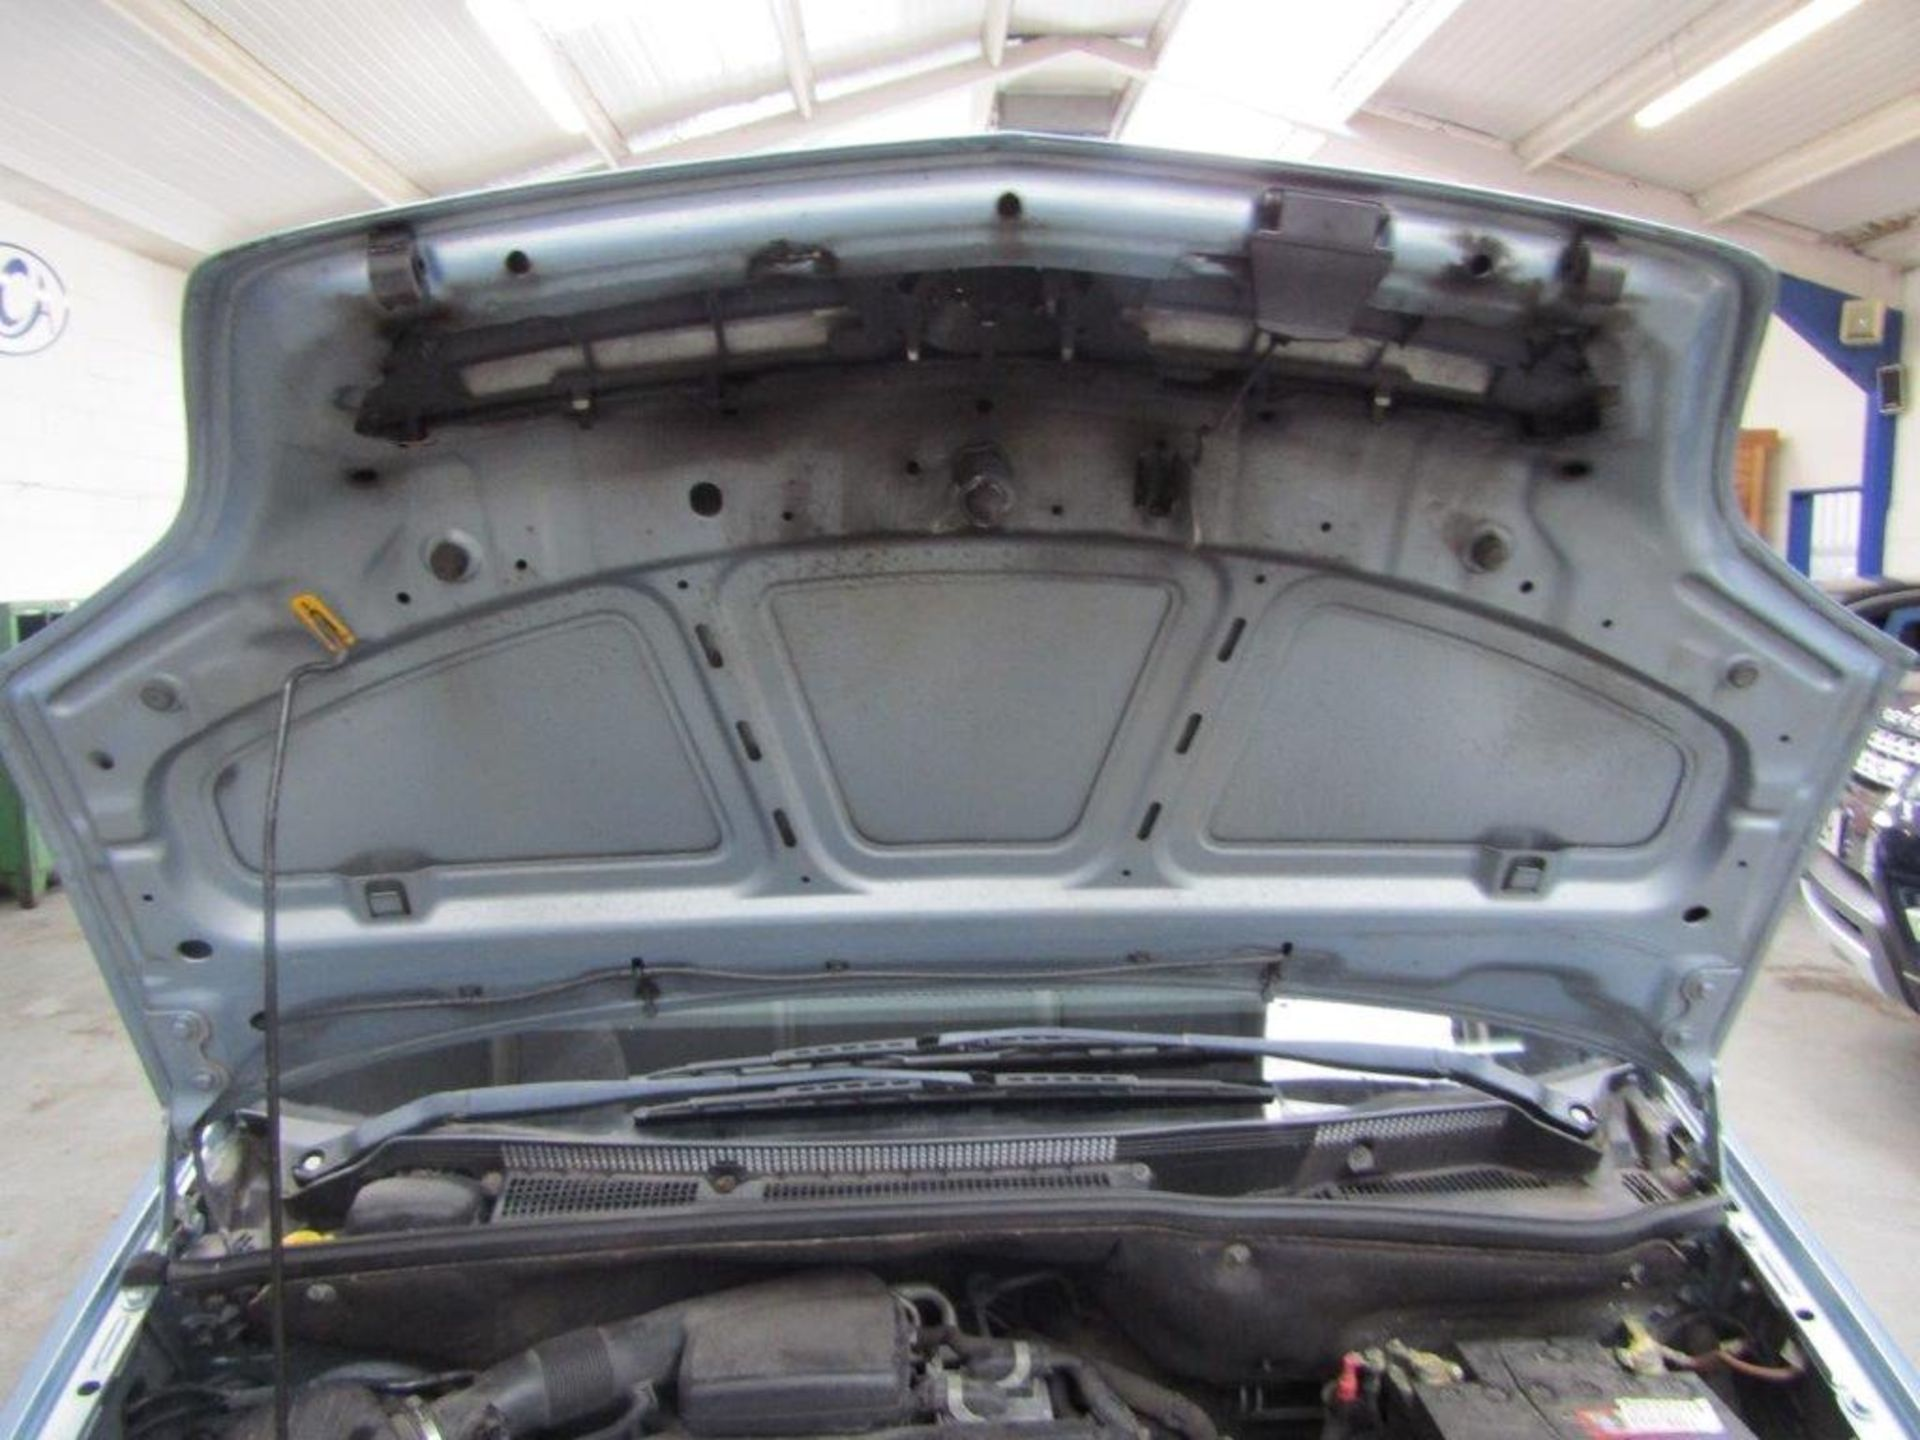 58 08 Vauxhall Meriva Design - Image 16 of 25